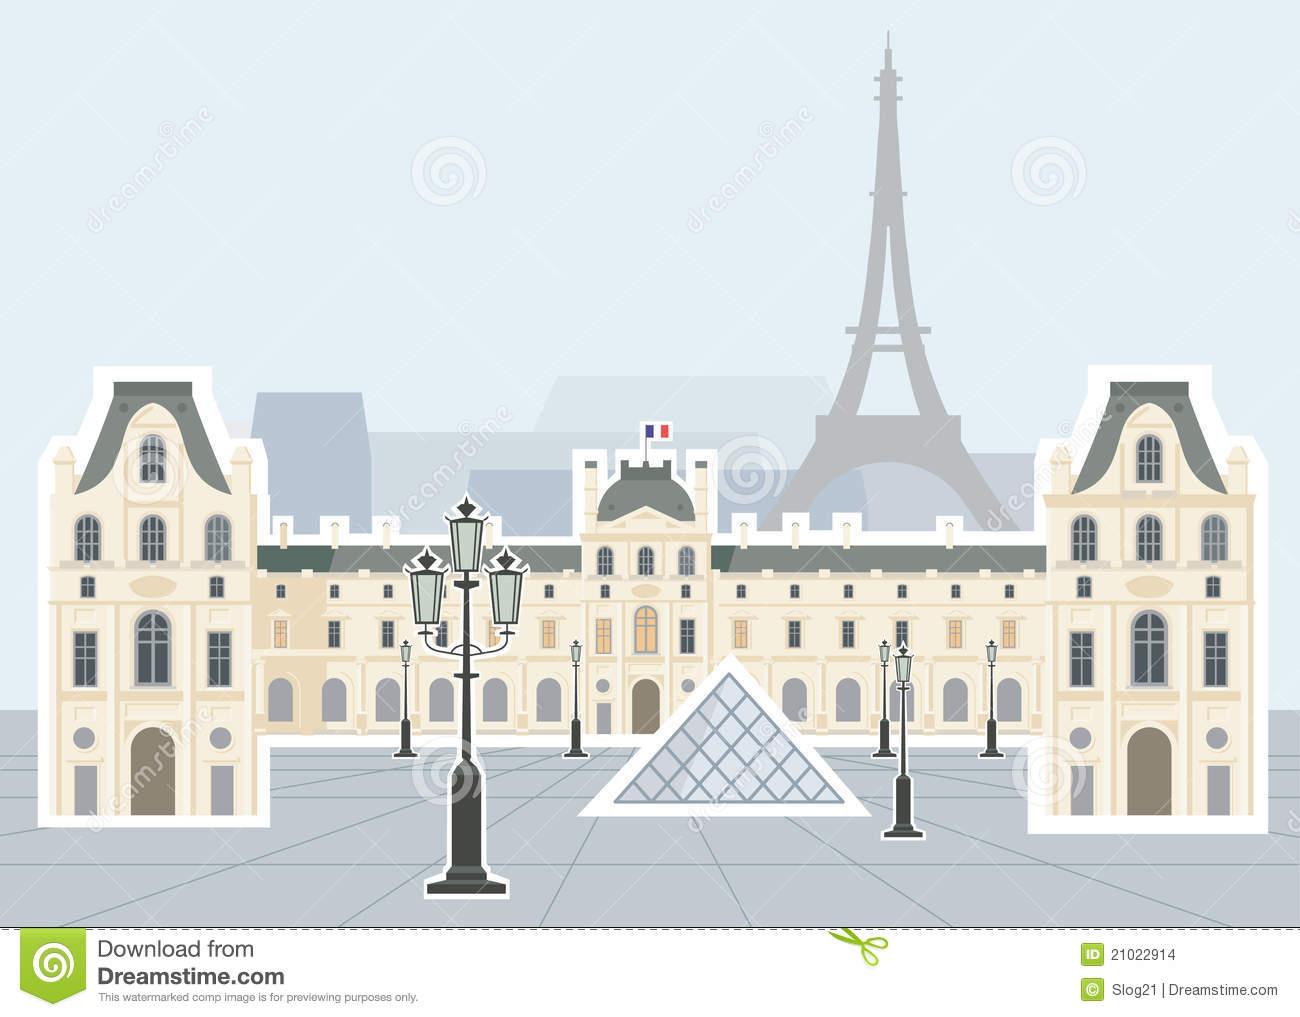 Louvre museum clipart.